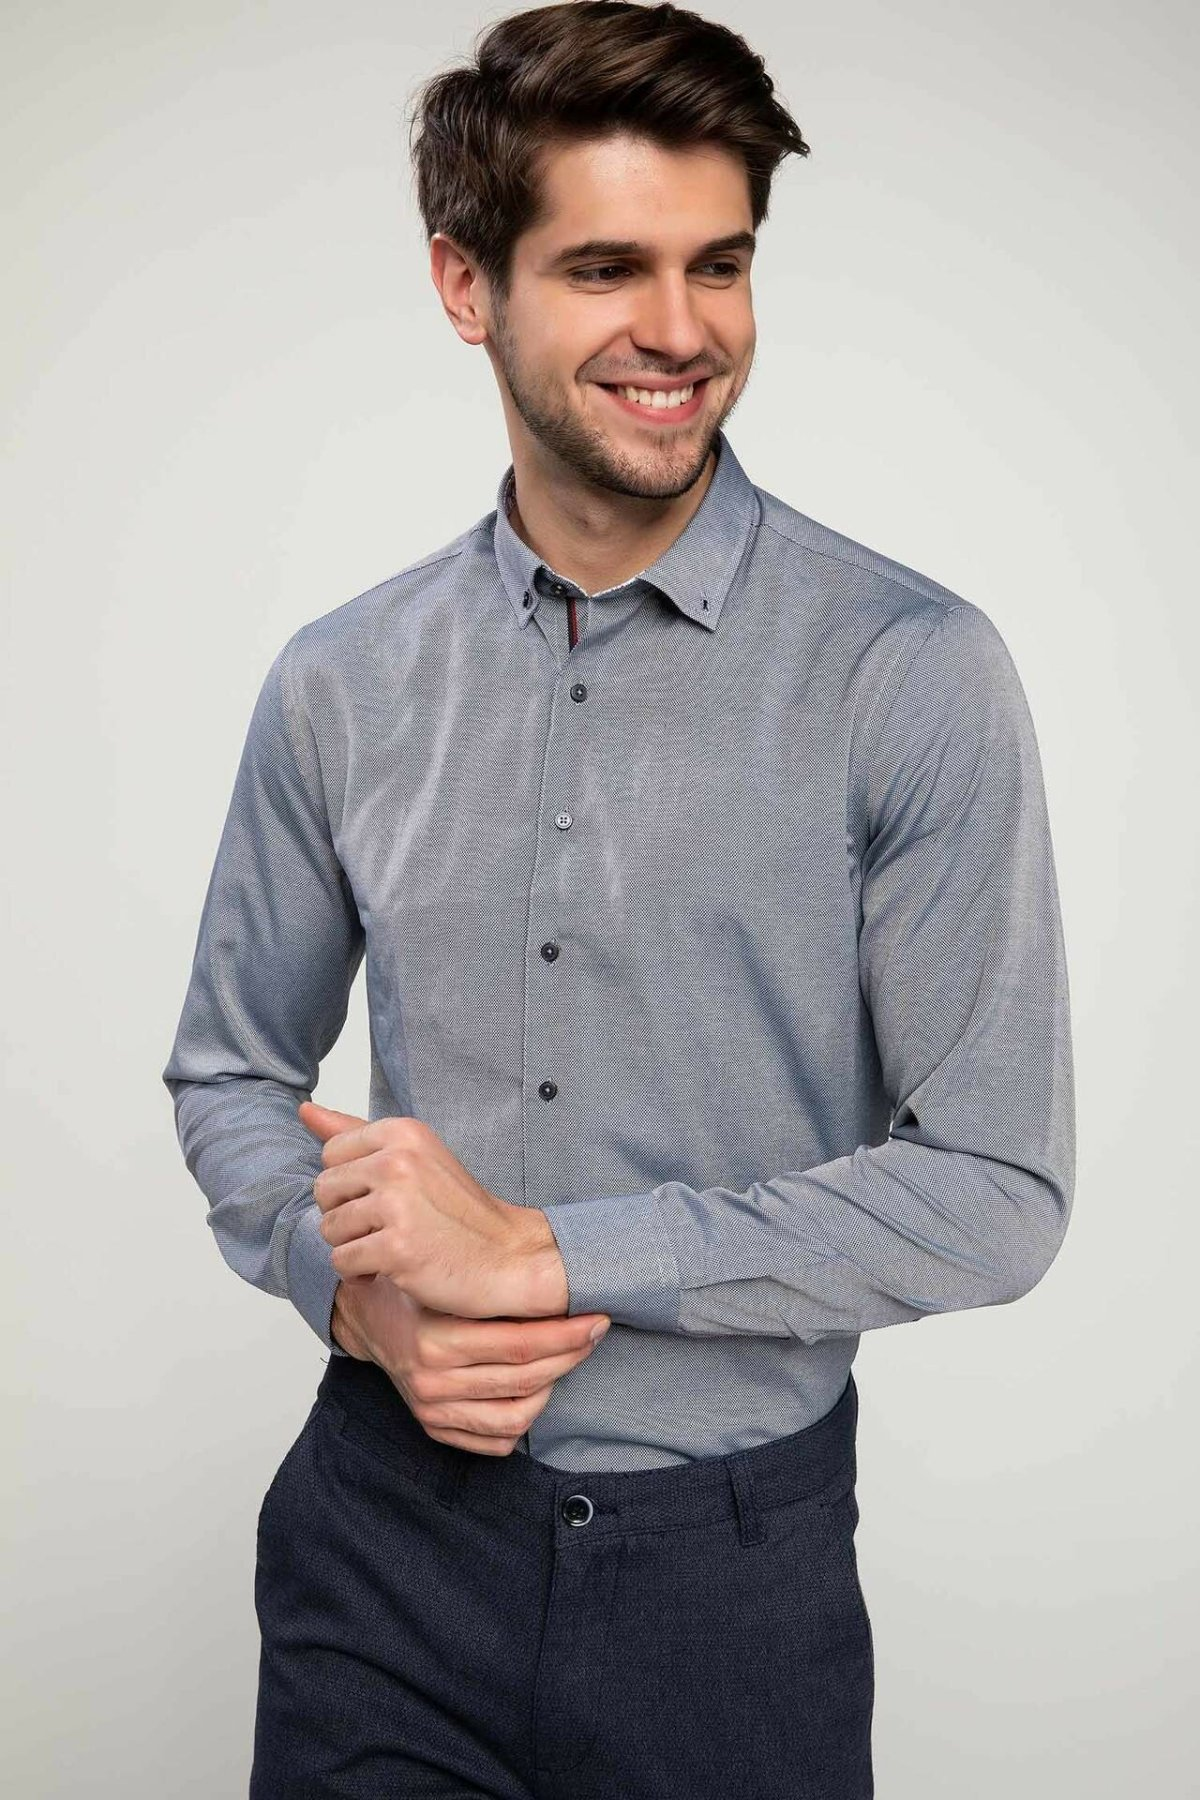 DeFacto Formal Autumn Fashion Man Lapel Long Sleeve Shirt Men's Casual High Quality Solid Blousers Male Loose Shirts-I7196AZ18AU